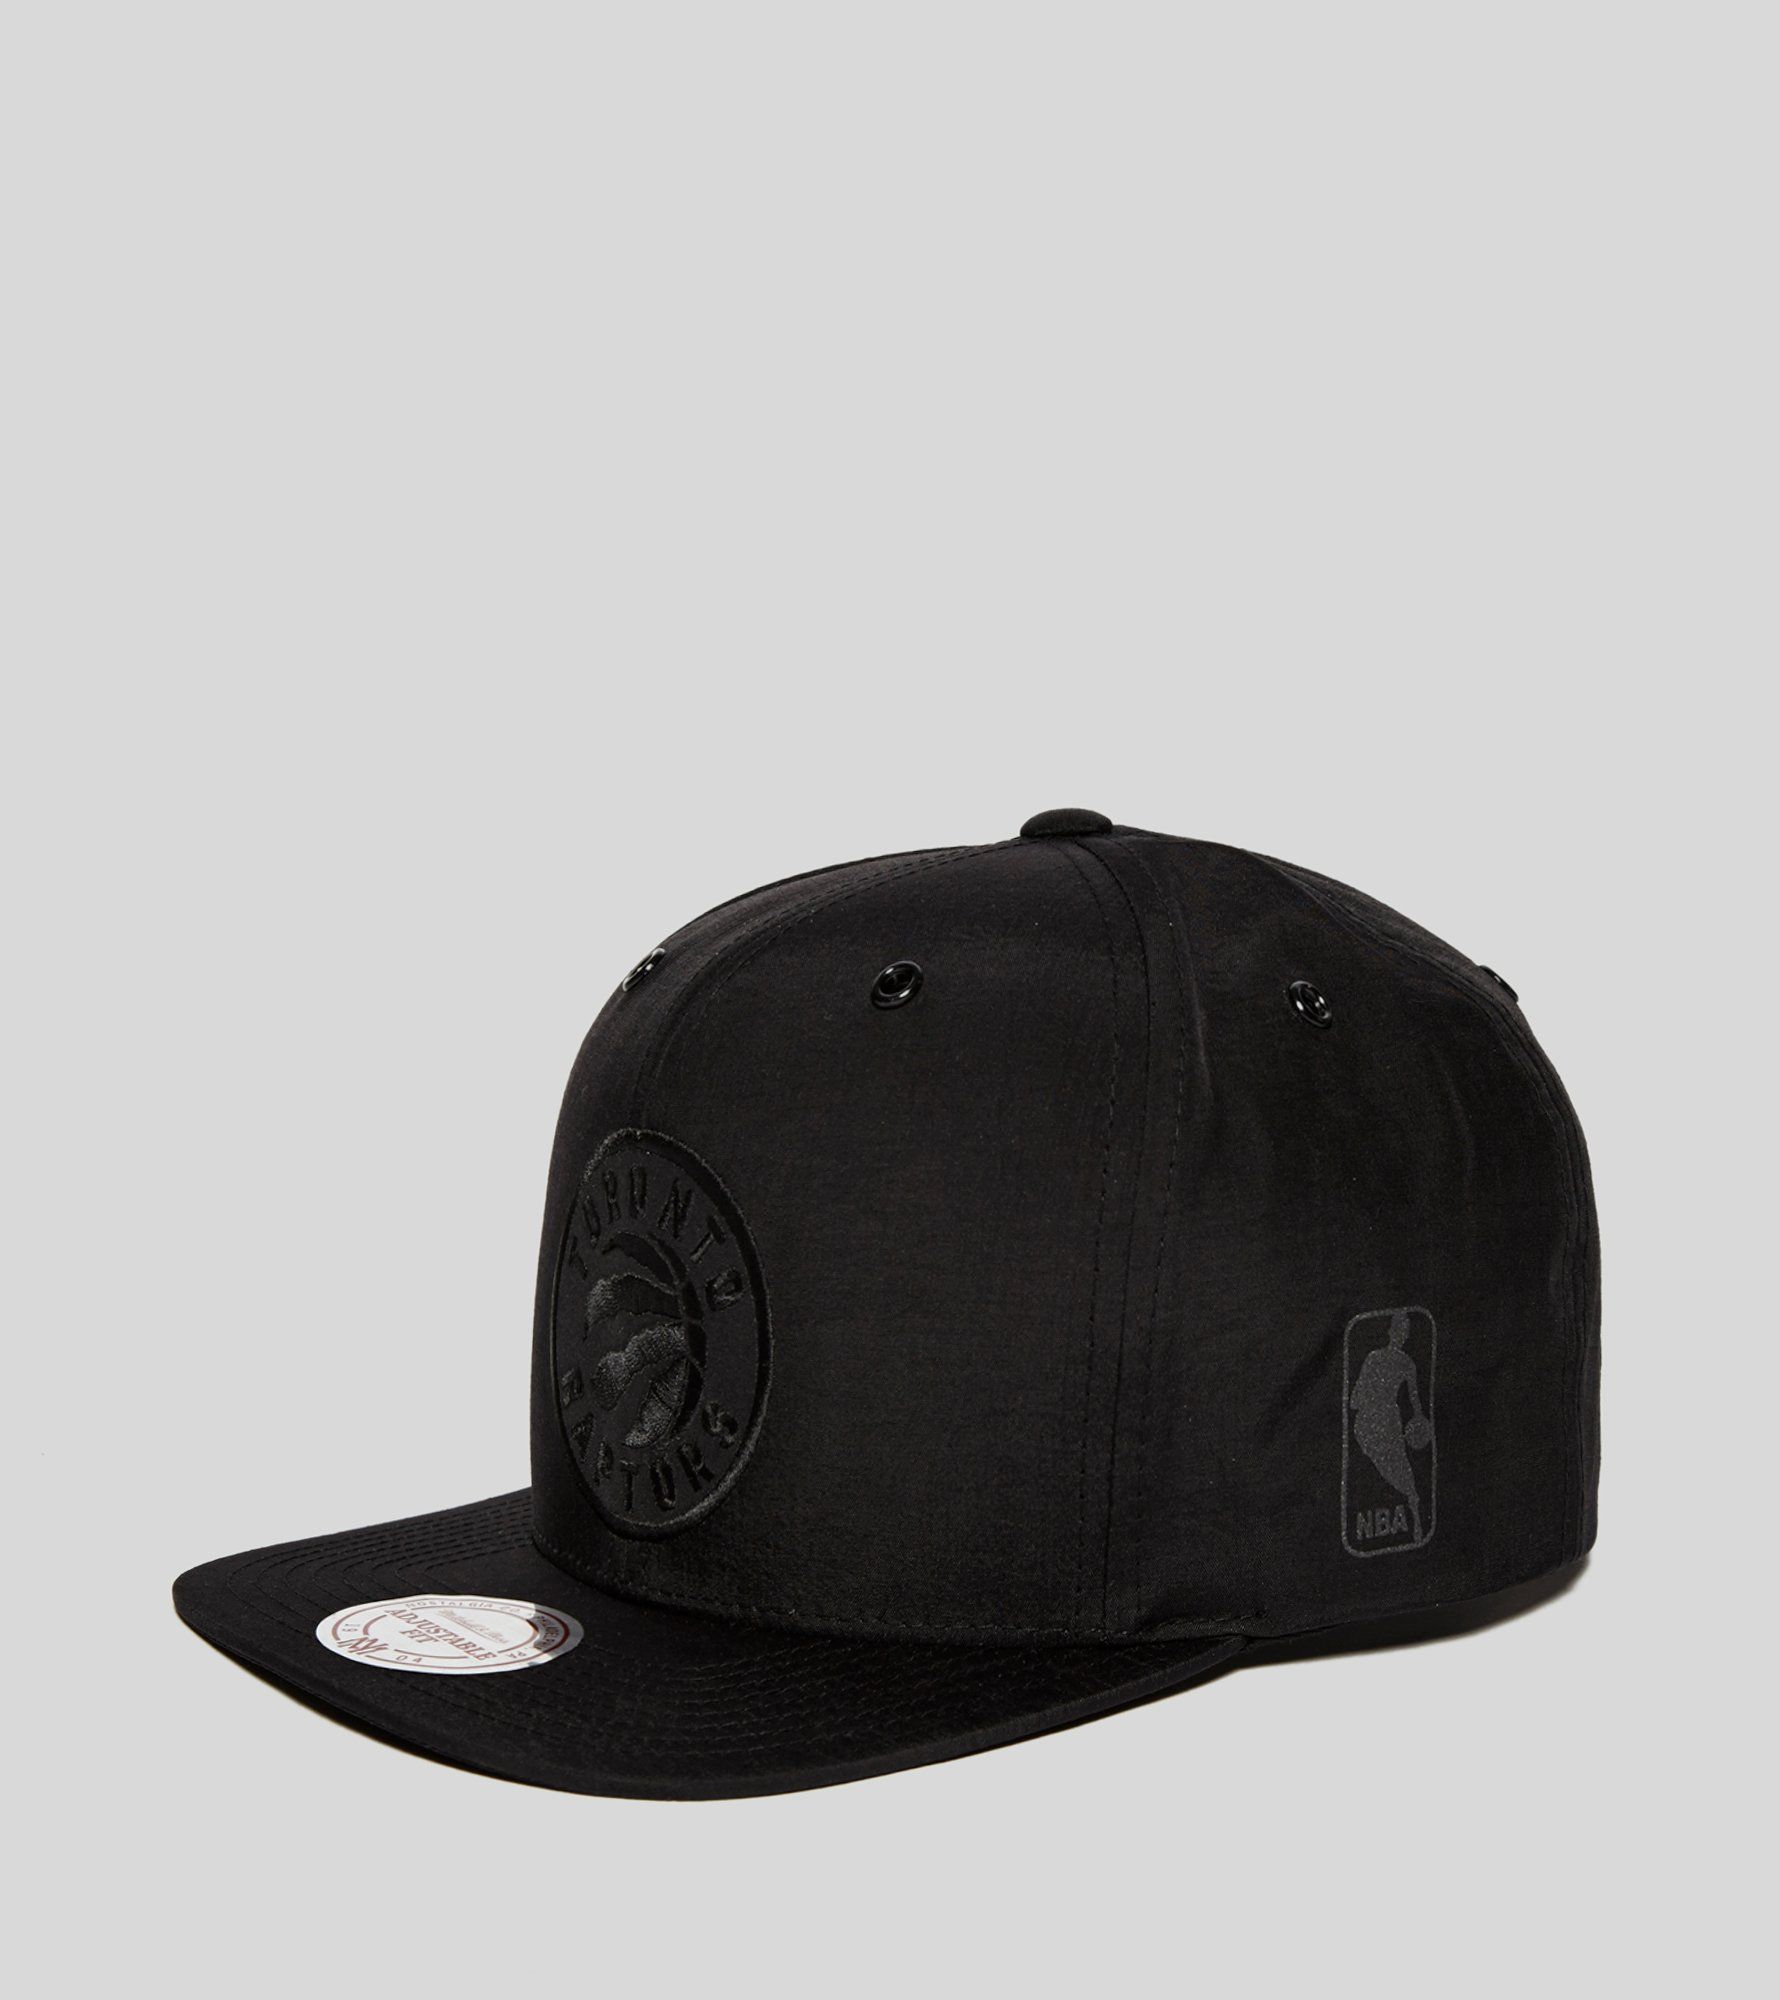 huge discount 51cd0 f1639 ... spain mitchell ness toronto raptors snapback cap size exclusive f3104  481d9